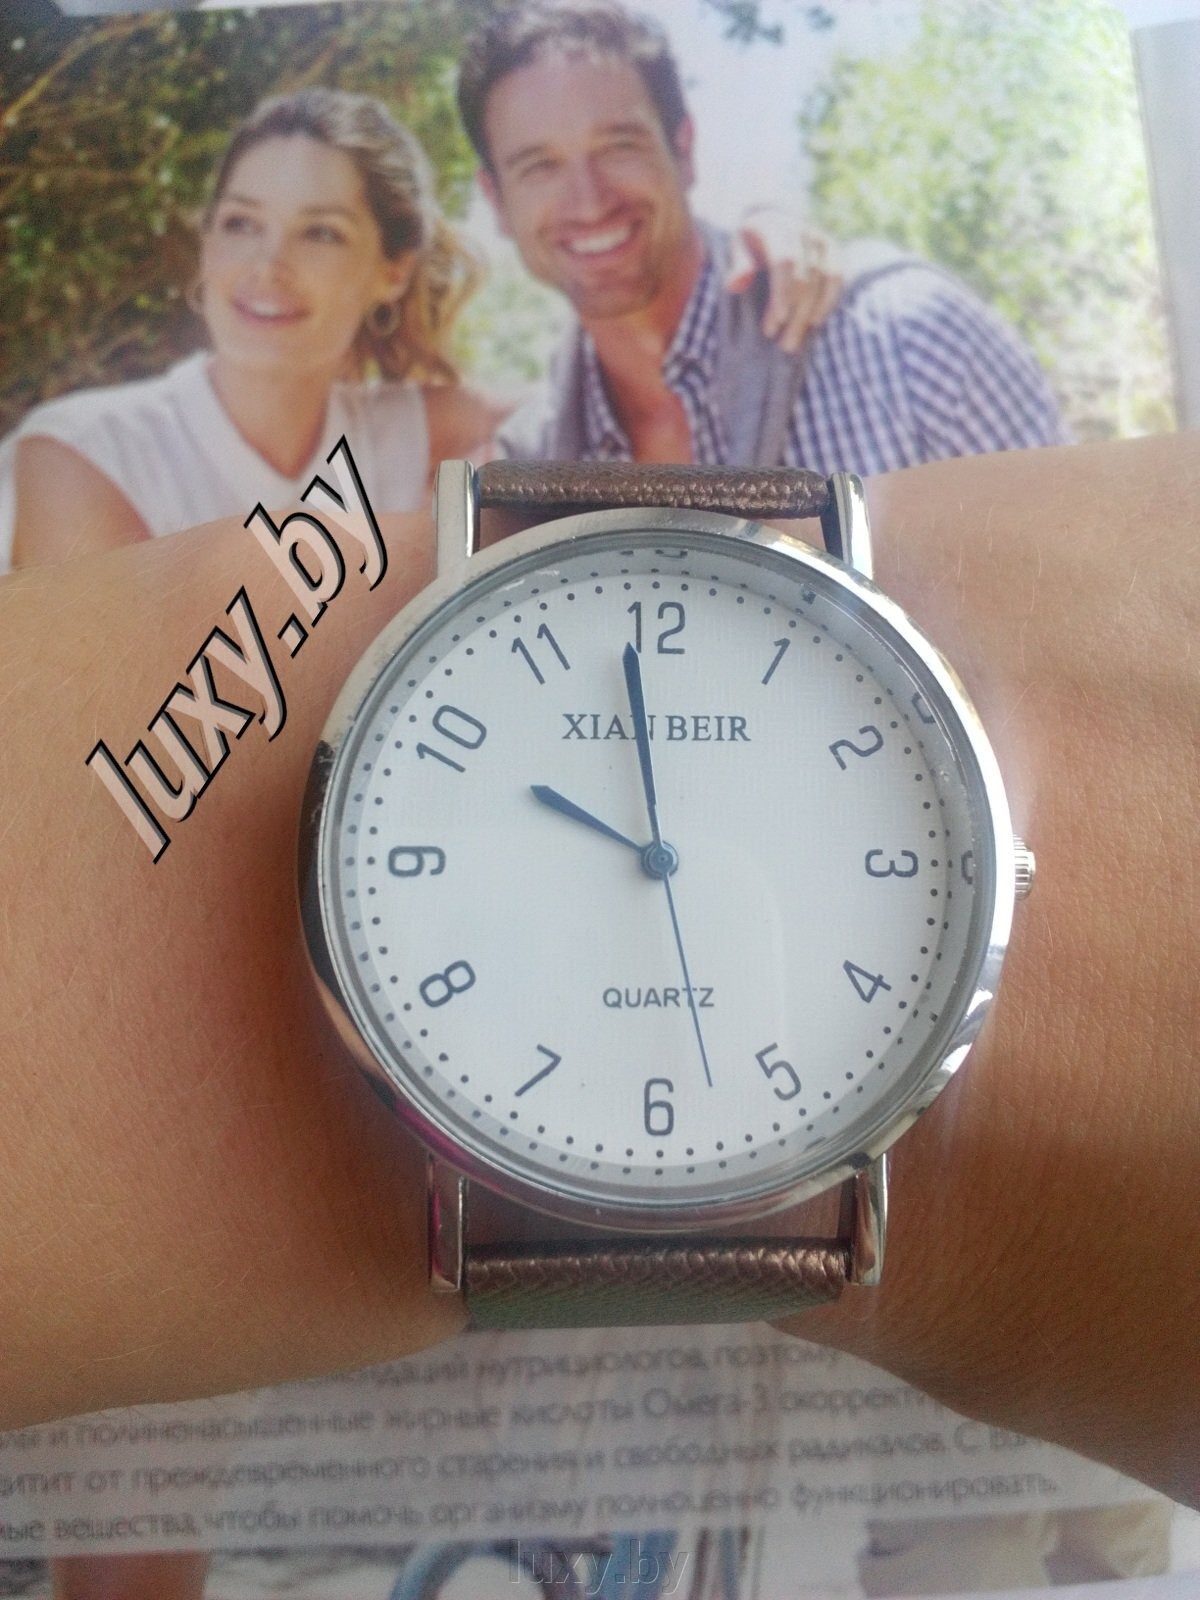 Часы наручные Xian beir, ремешок коричневый, арт. Н-27 - фото pic_4c8fb9e11934ea0_1920x9000_1.jpg